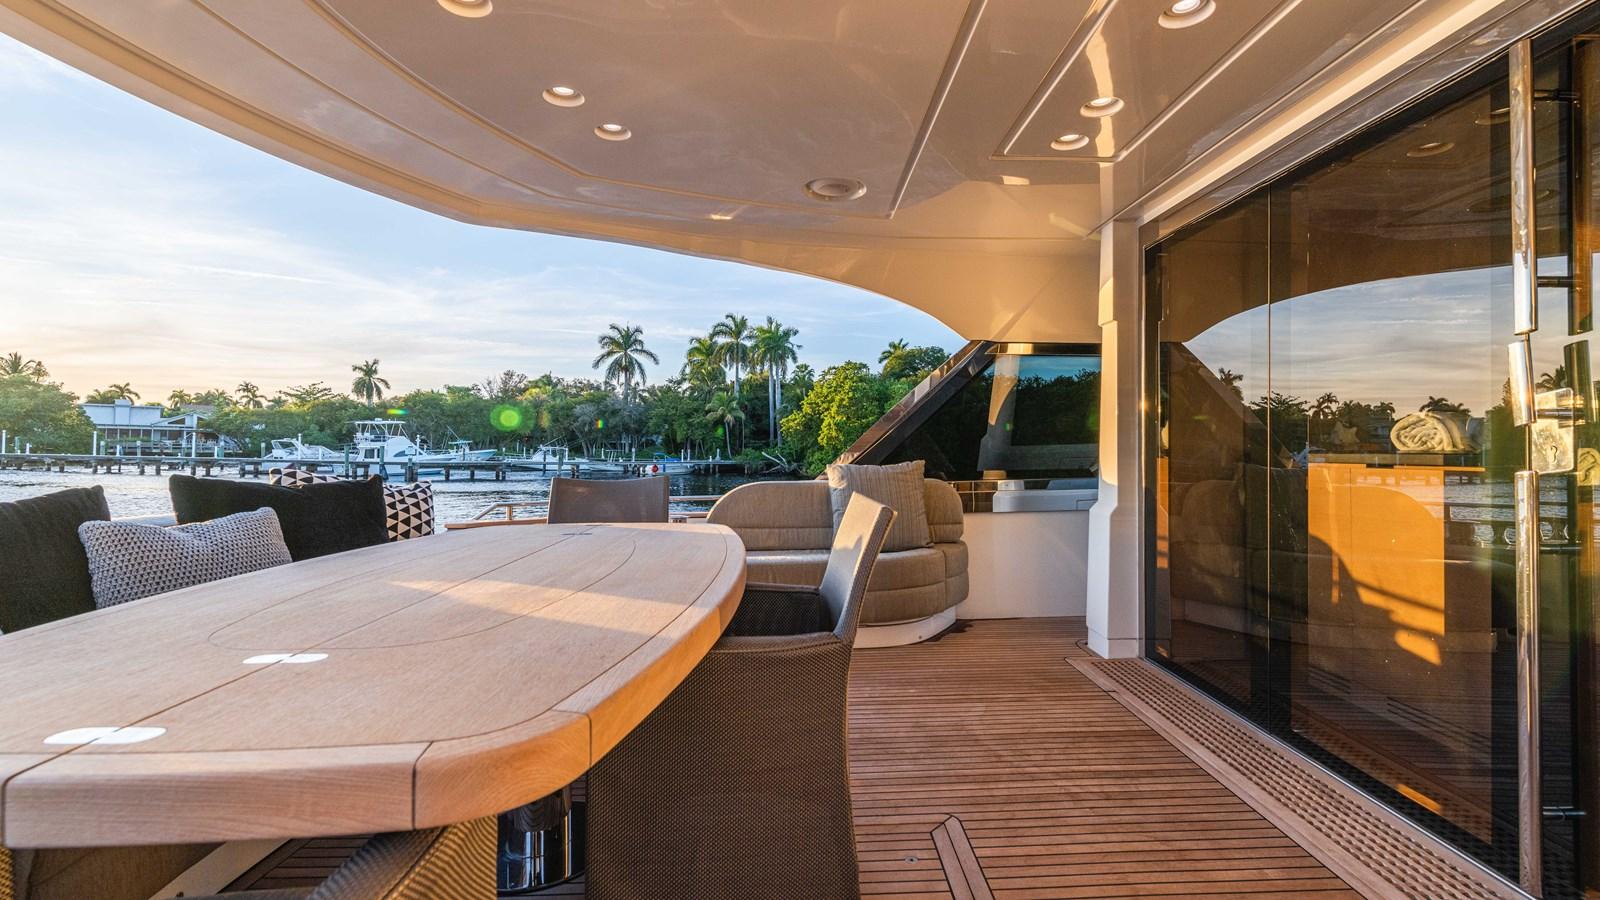 76 Monte Carlo (77 of 127) 2014 MONTE CARLO YACHTS Motoryacht Motor Yacht 2825063